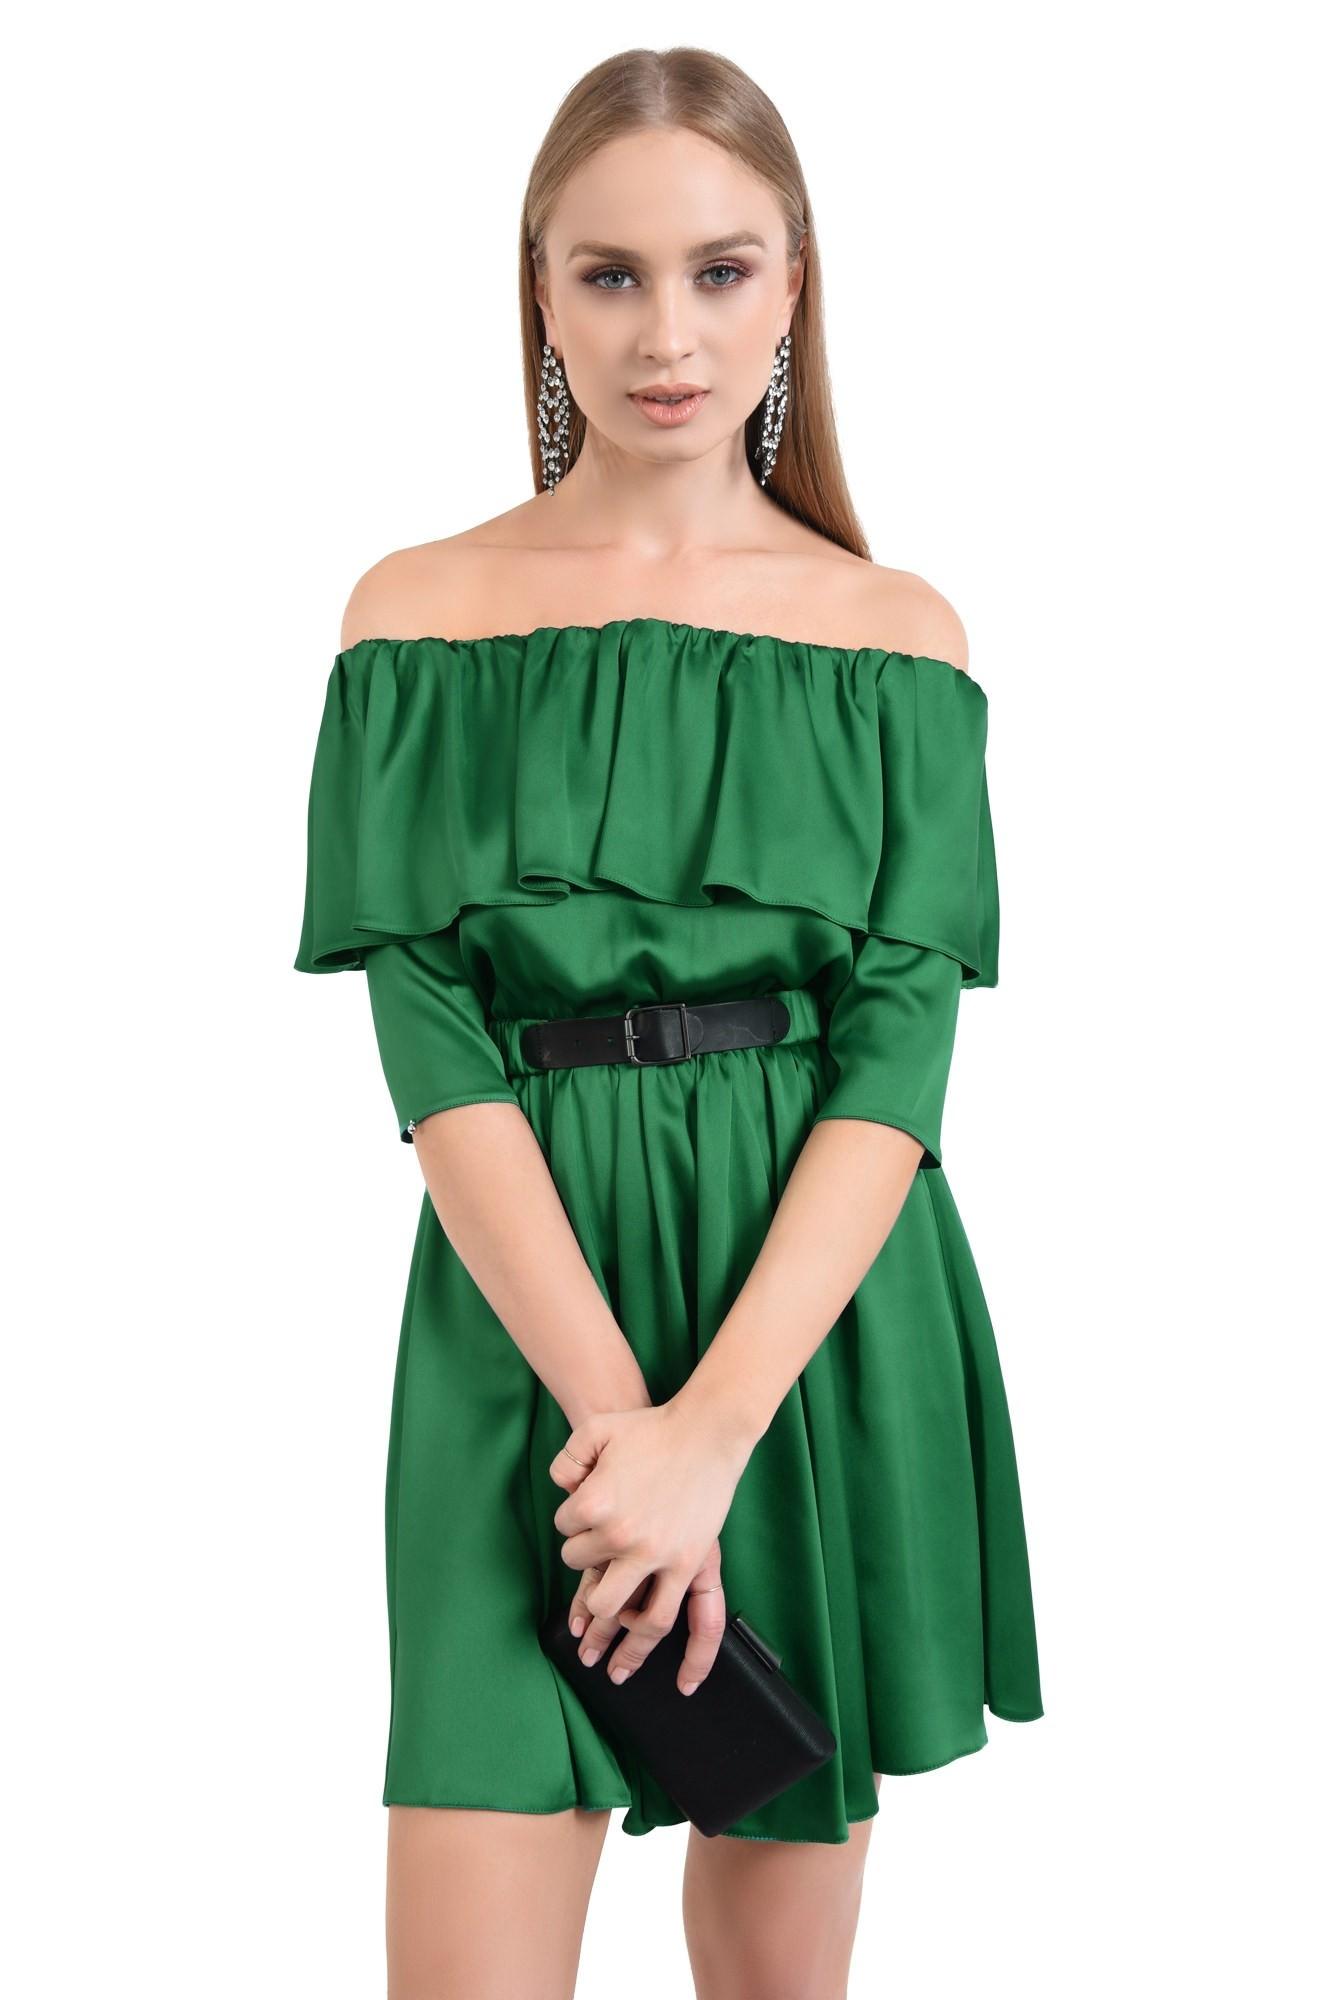 0 - rochie de seara, cloche, curea, satin, verde